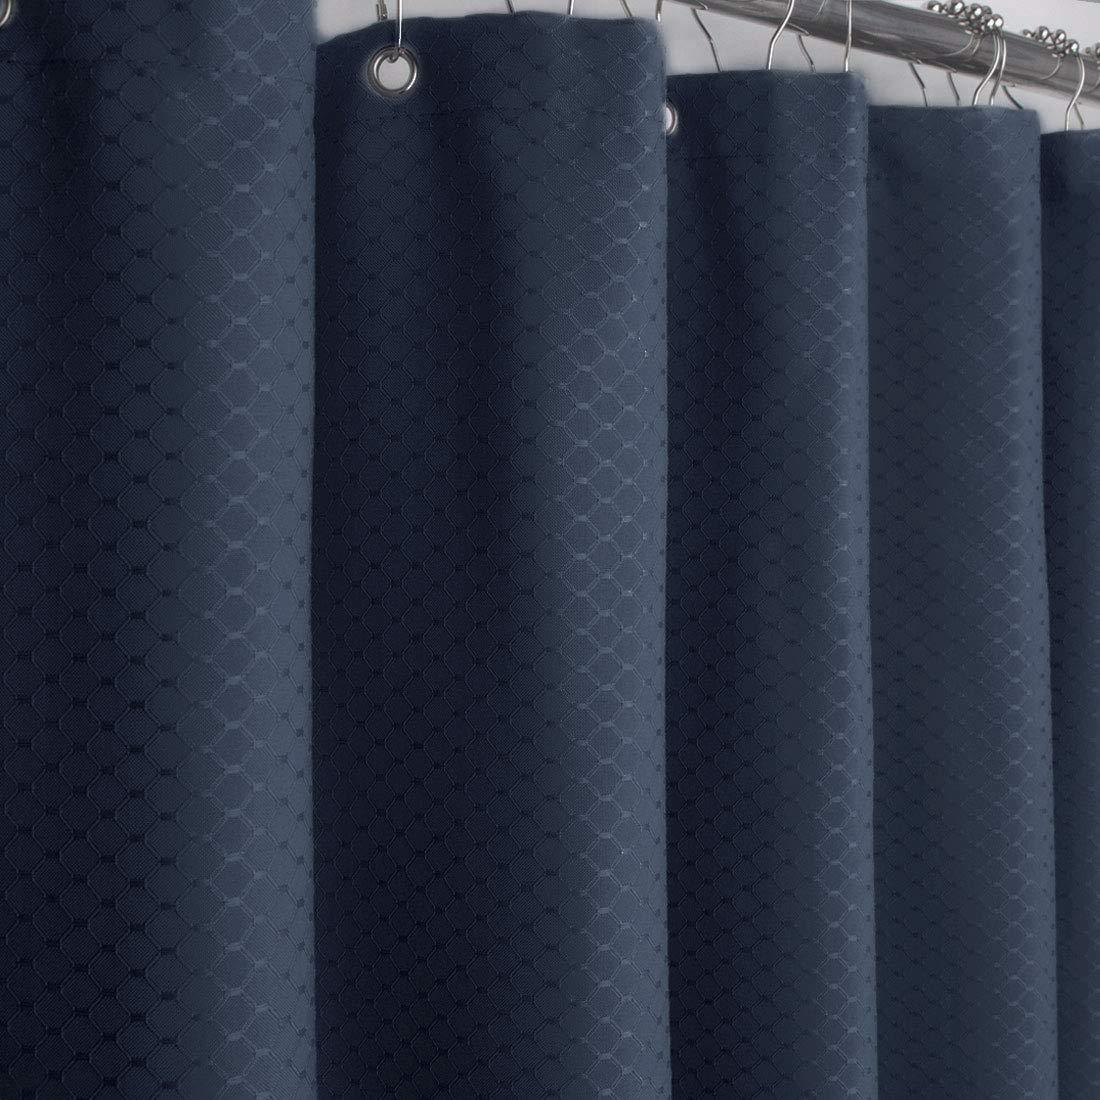 Amazon.com: Eforgift Waffle tela cortina de ducha tela de ...